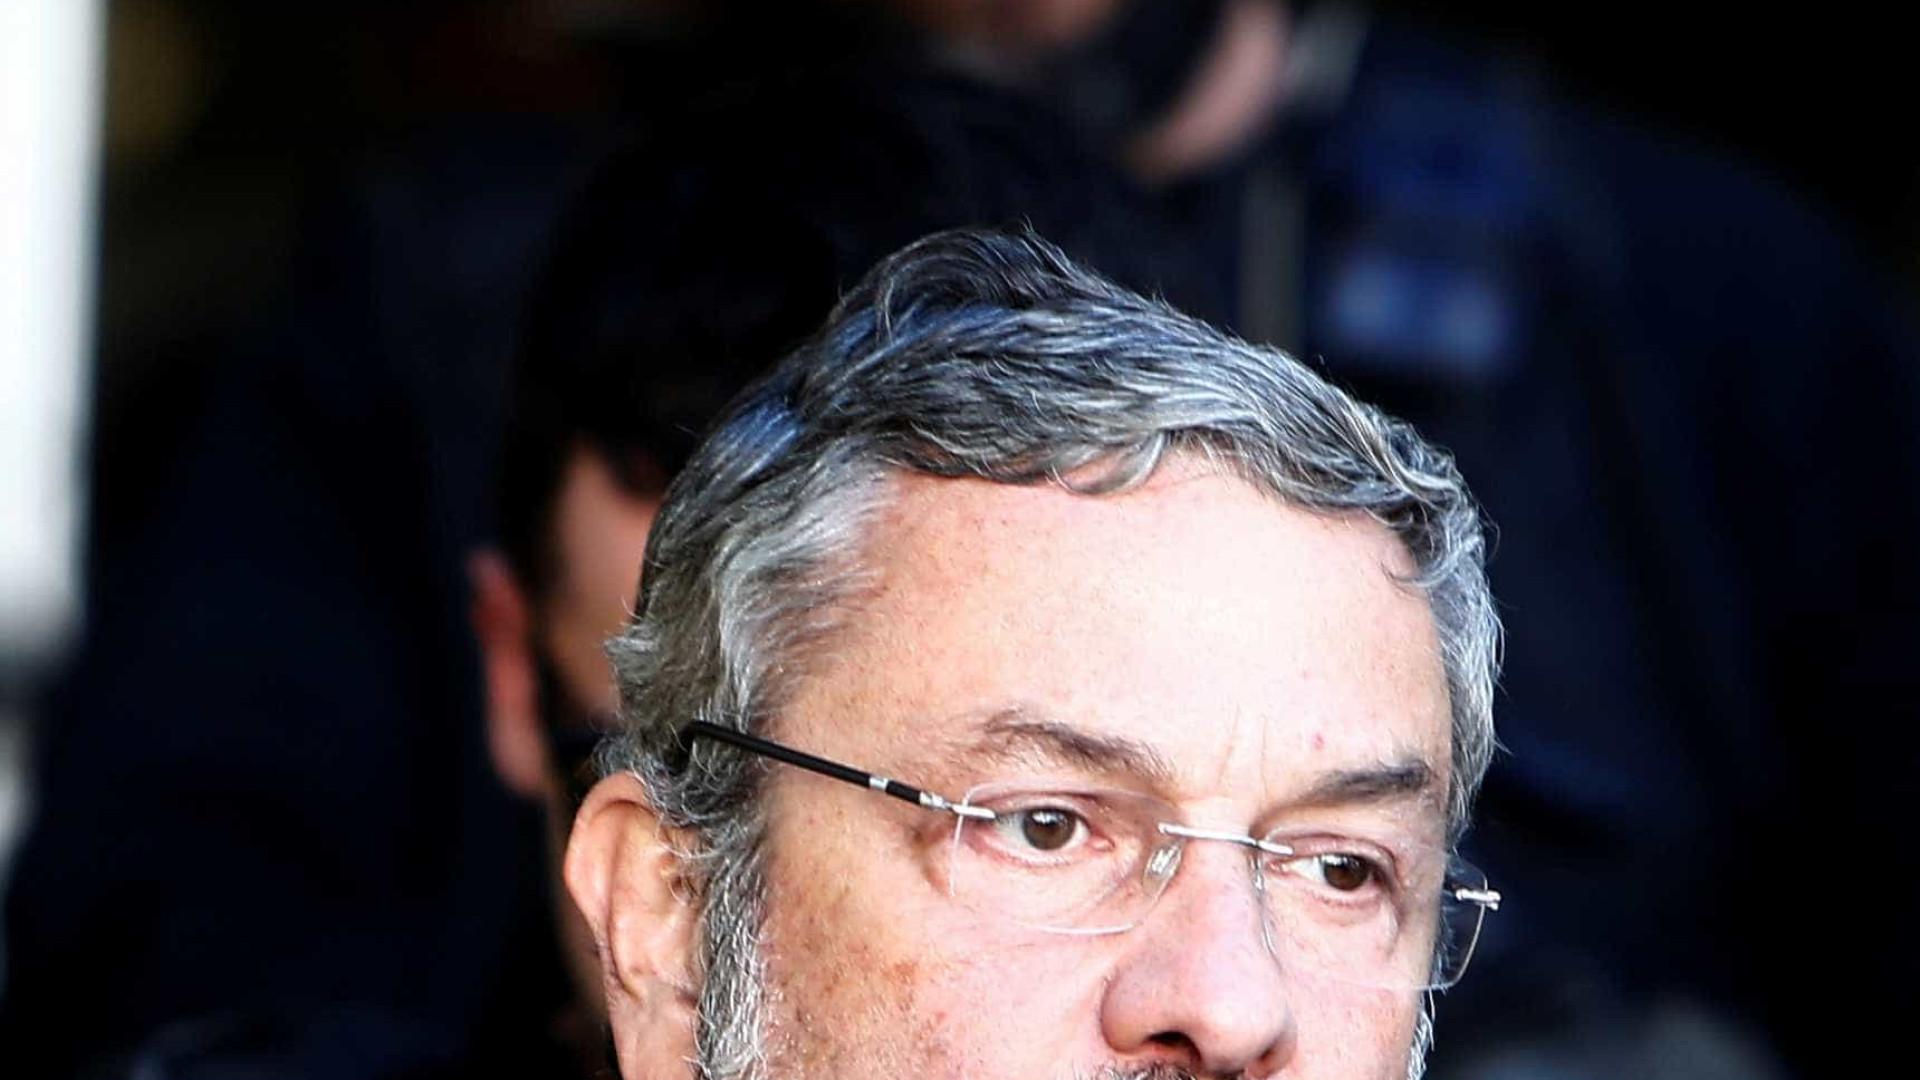 Moro aceita pedido de prisão preventiva de Palocci